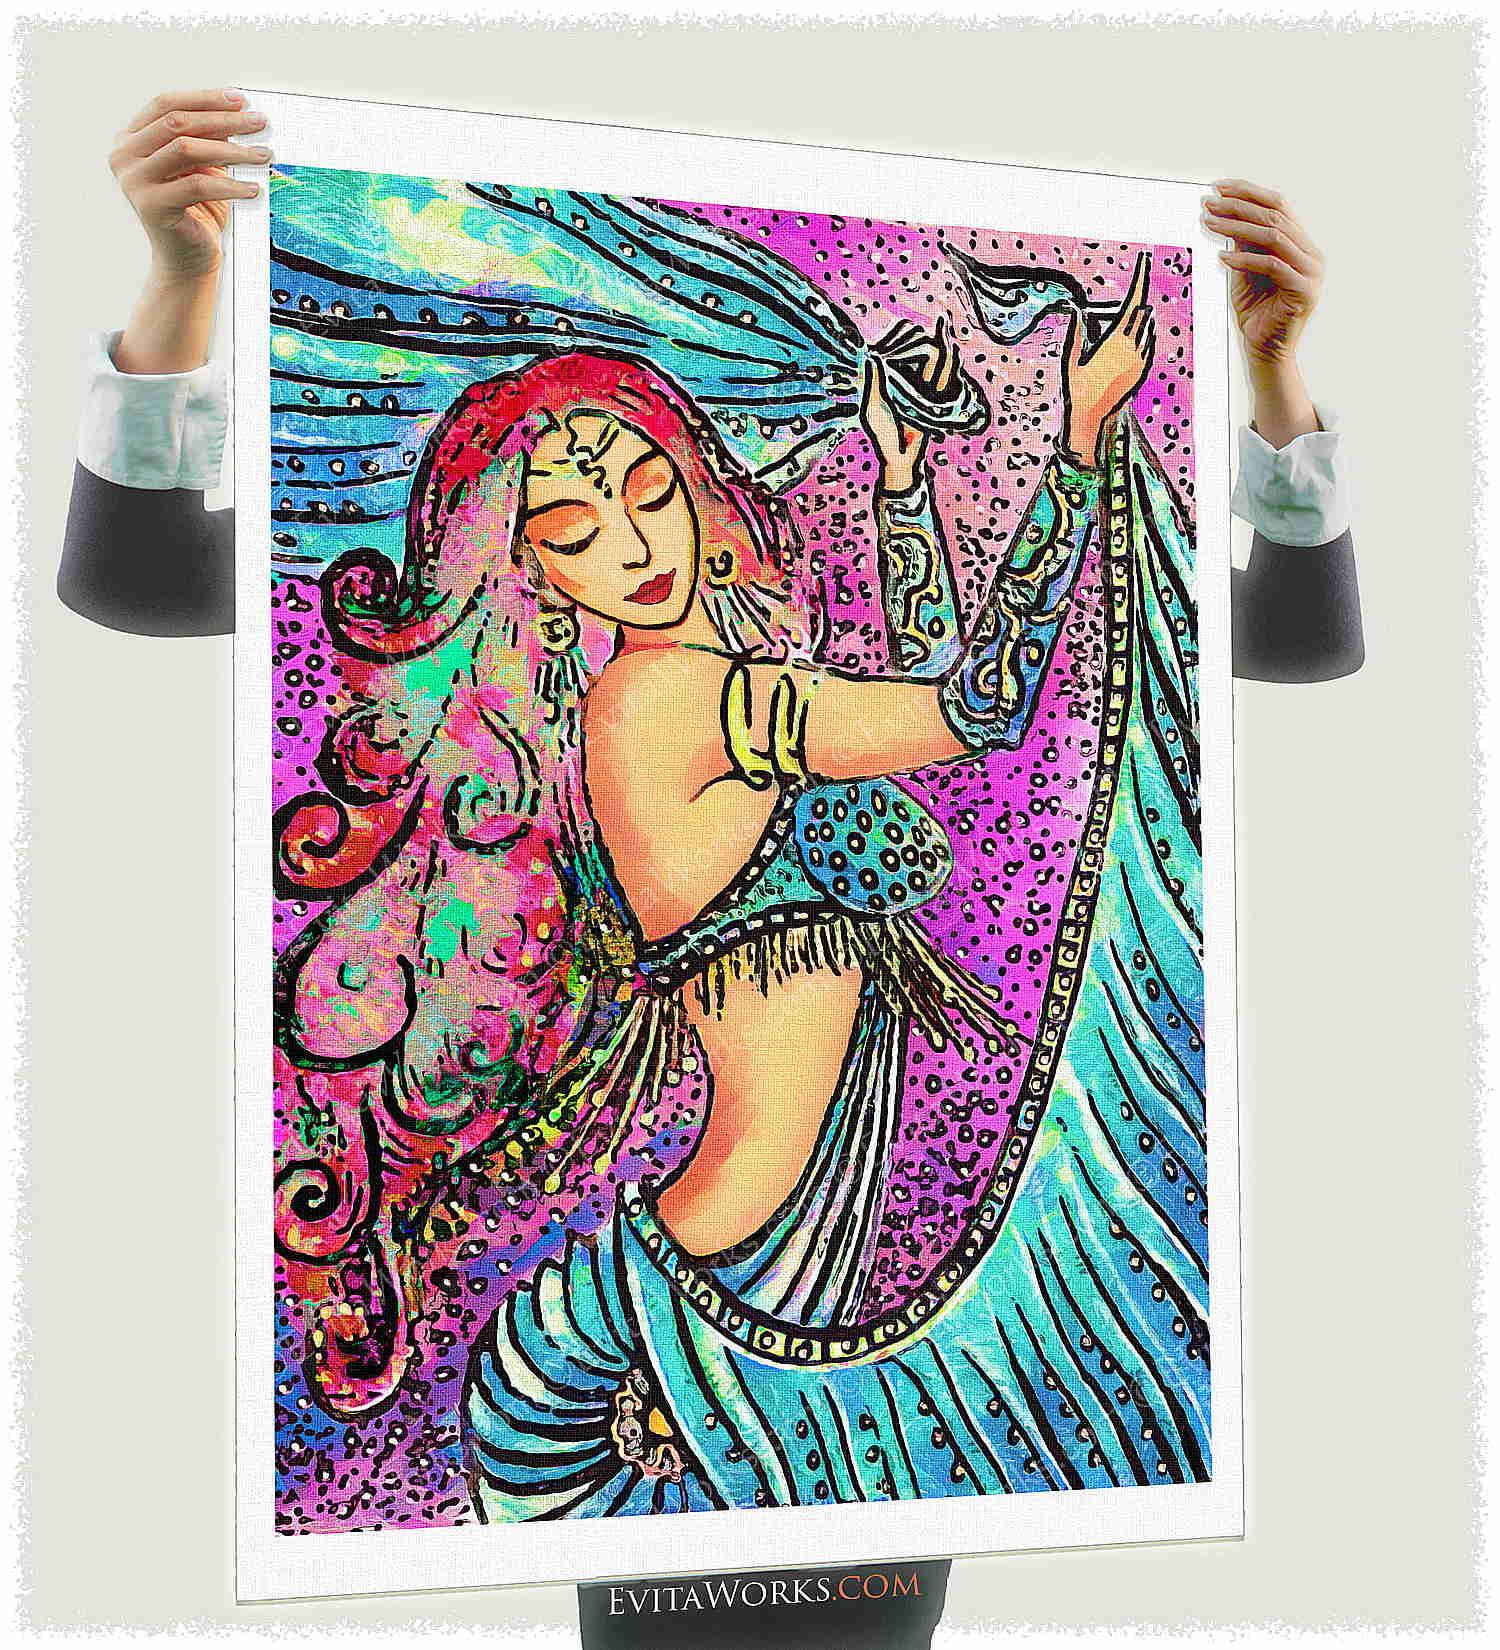 ao belly dancer 04 a1 ~ EvitaWorks